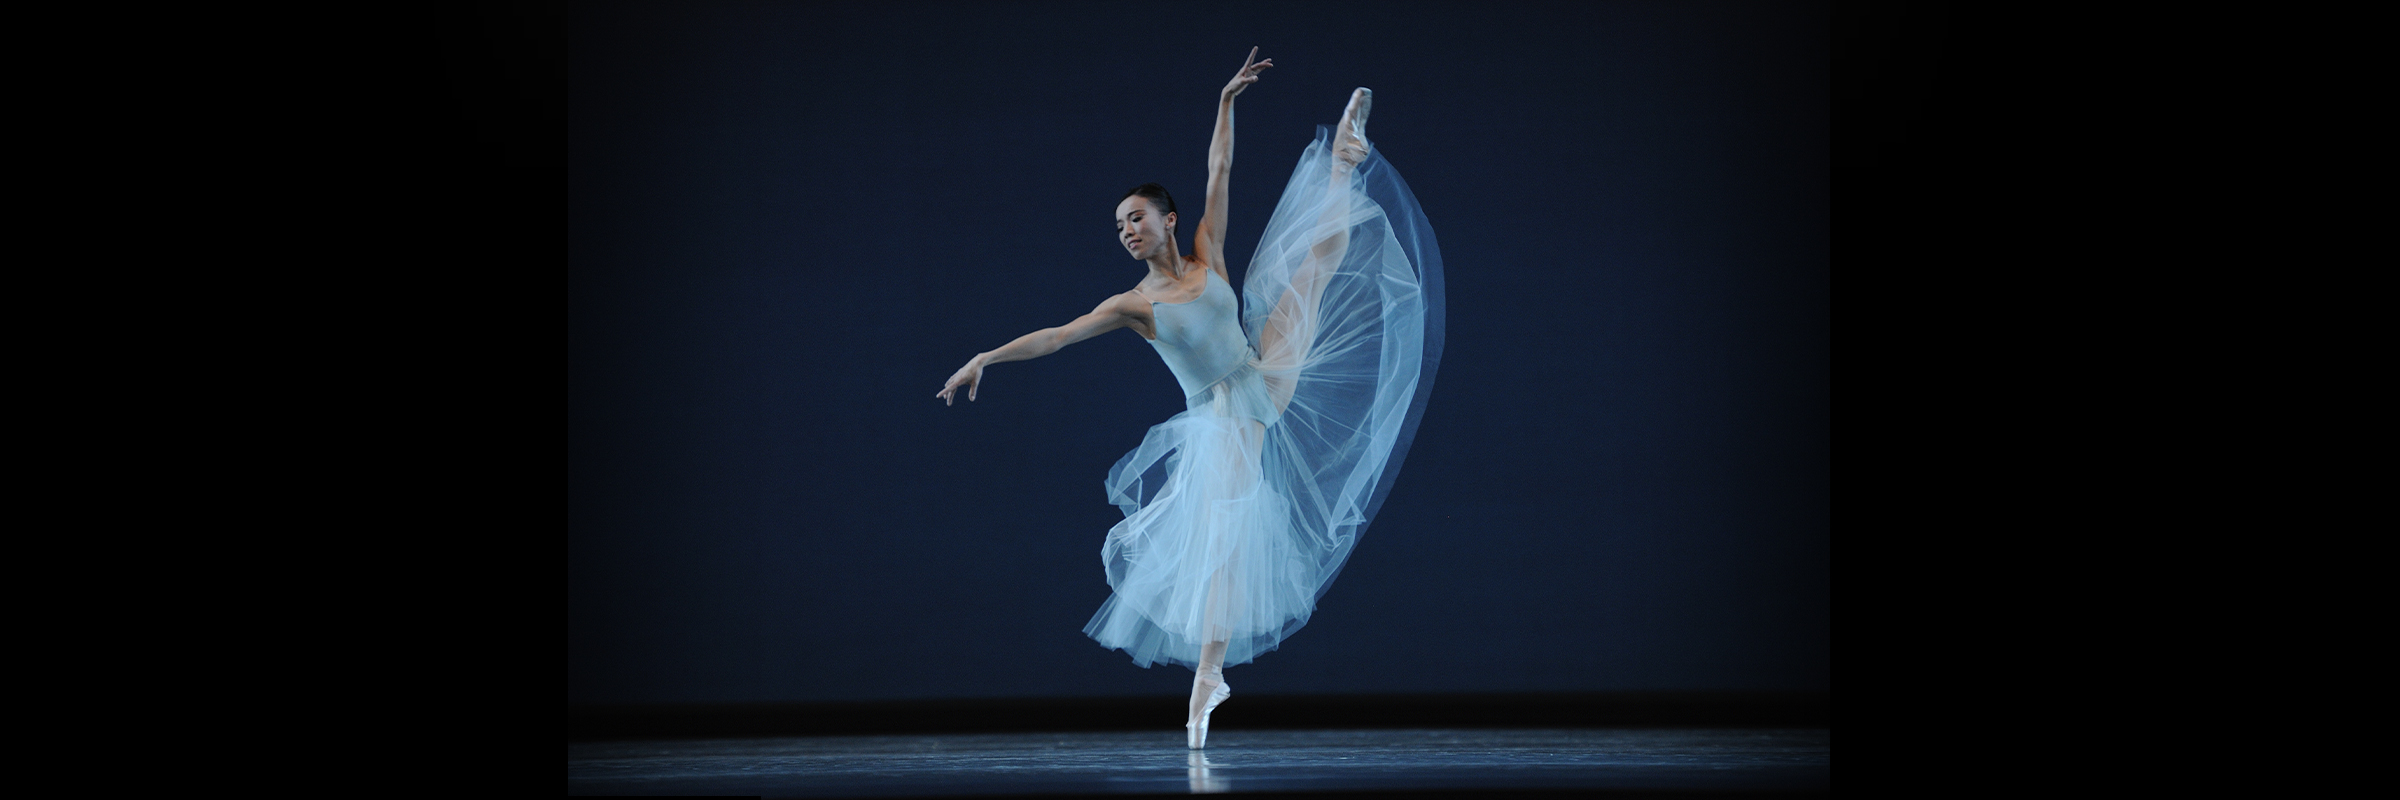 Frances Chung in Balanchine's Serenade // Choreography by George Balanchine © The Balanchine Trust; Photo © Erik Tomasson